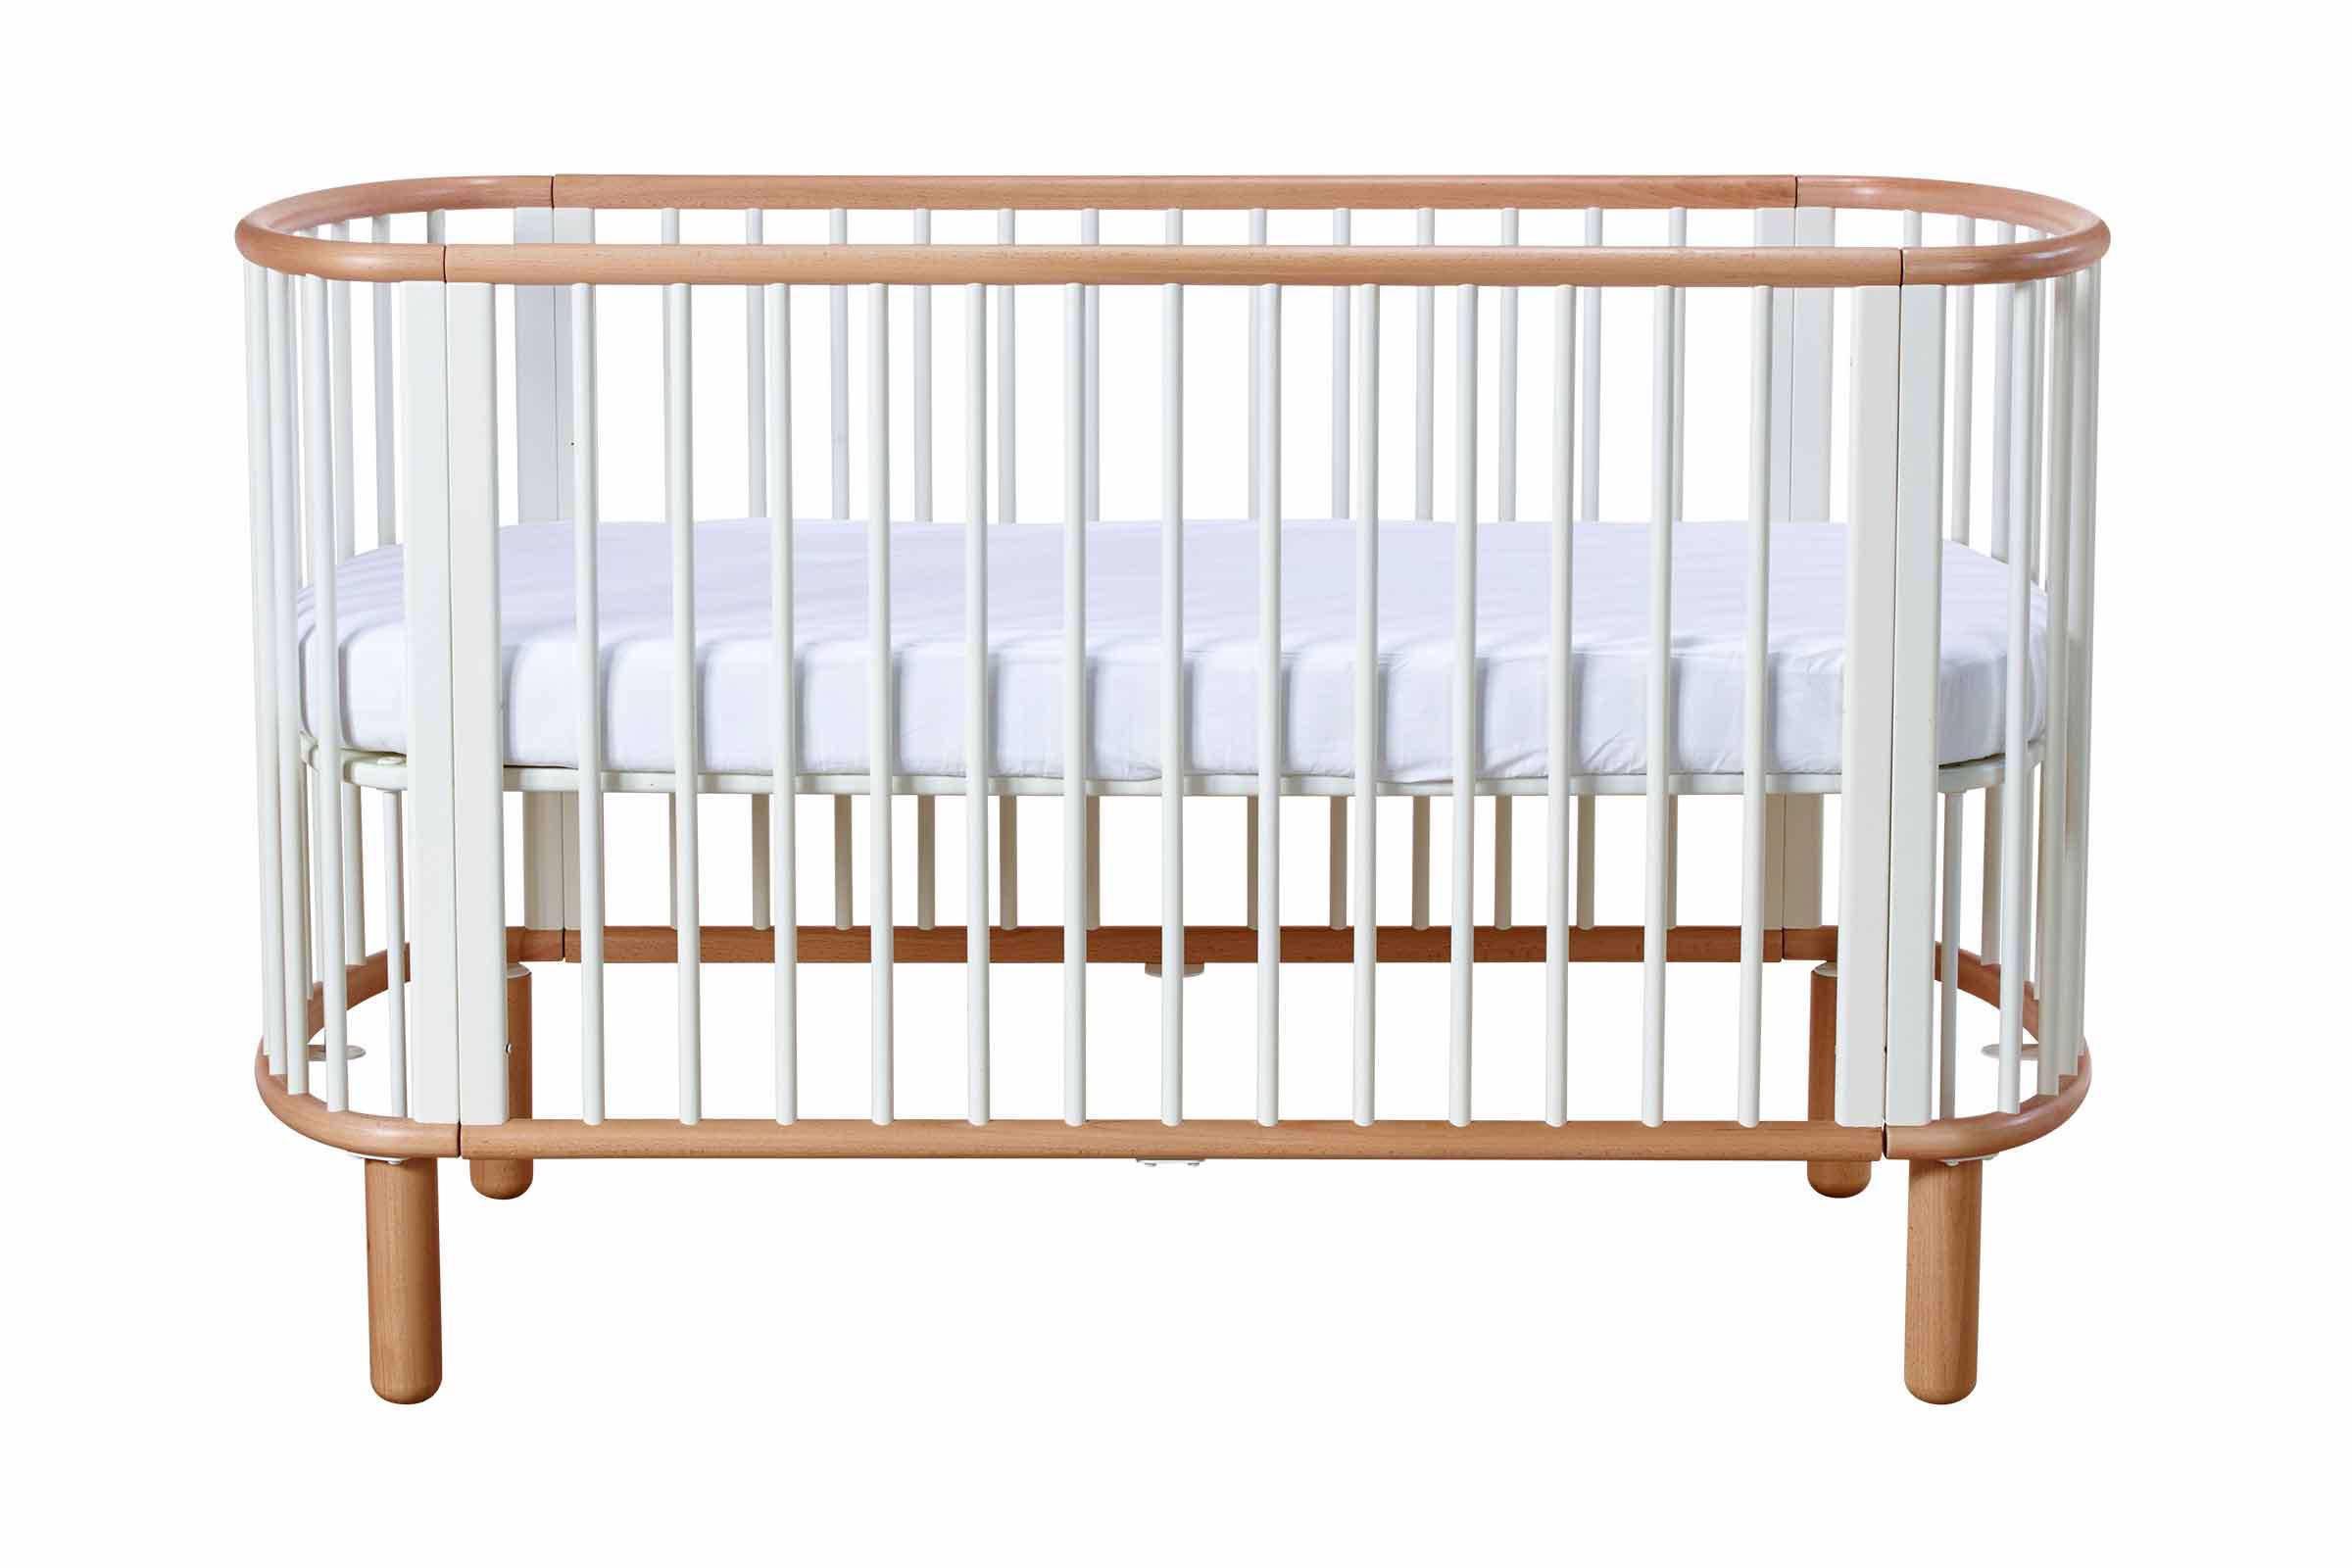 Babybed Aan Bed.5 In 1 Babybed 70x140 Cm